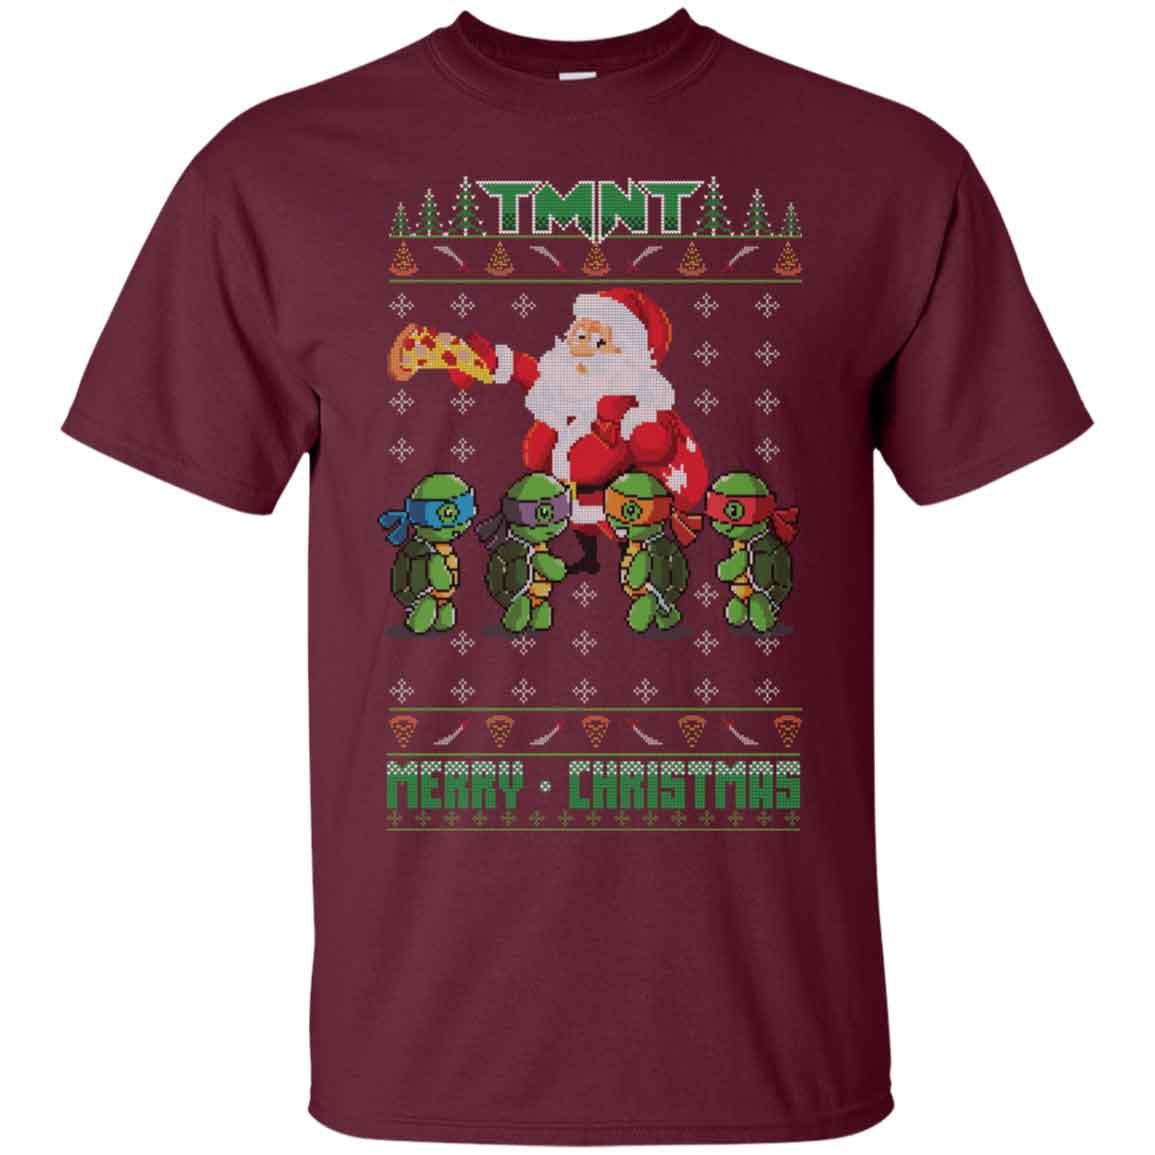 Teenage Mutant Ninja Turtles Ugly Christmas Merry Christmas ...